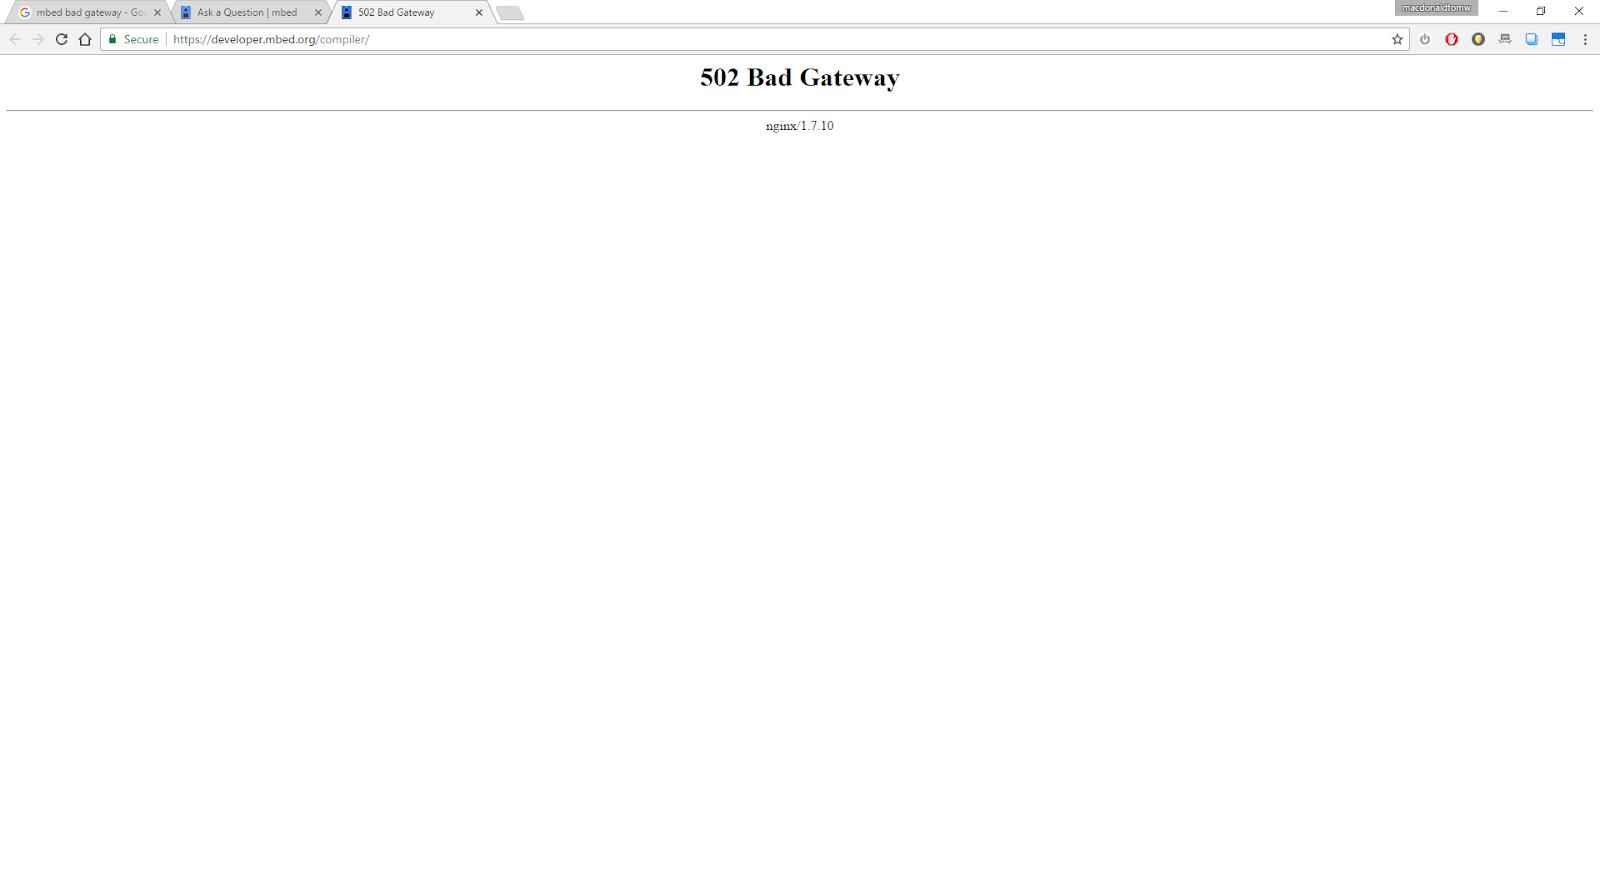 502 bad gateway error